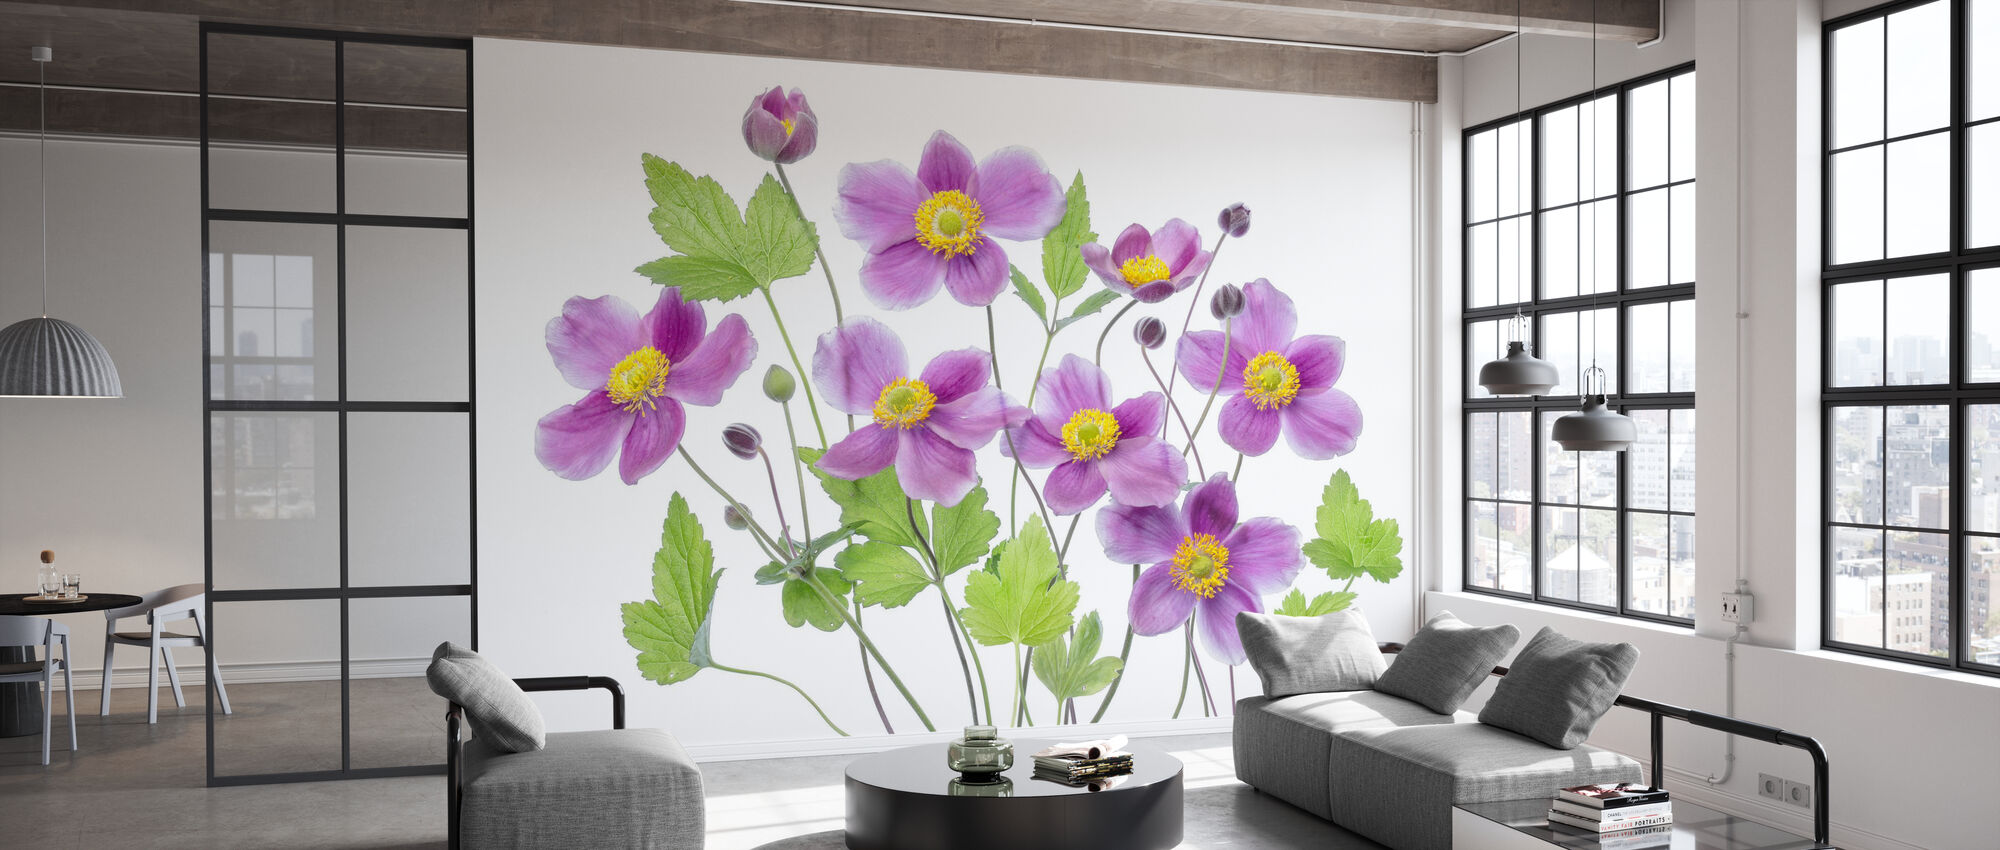 Anemone Hadspen Abundance - Wallpaper - Office